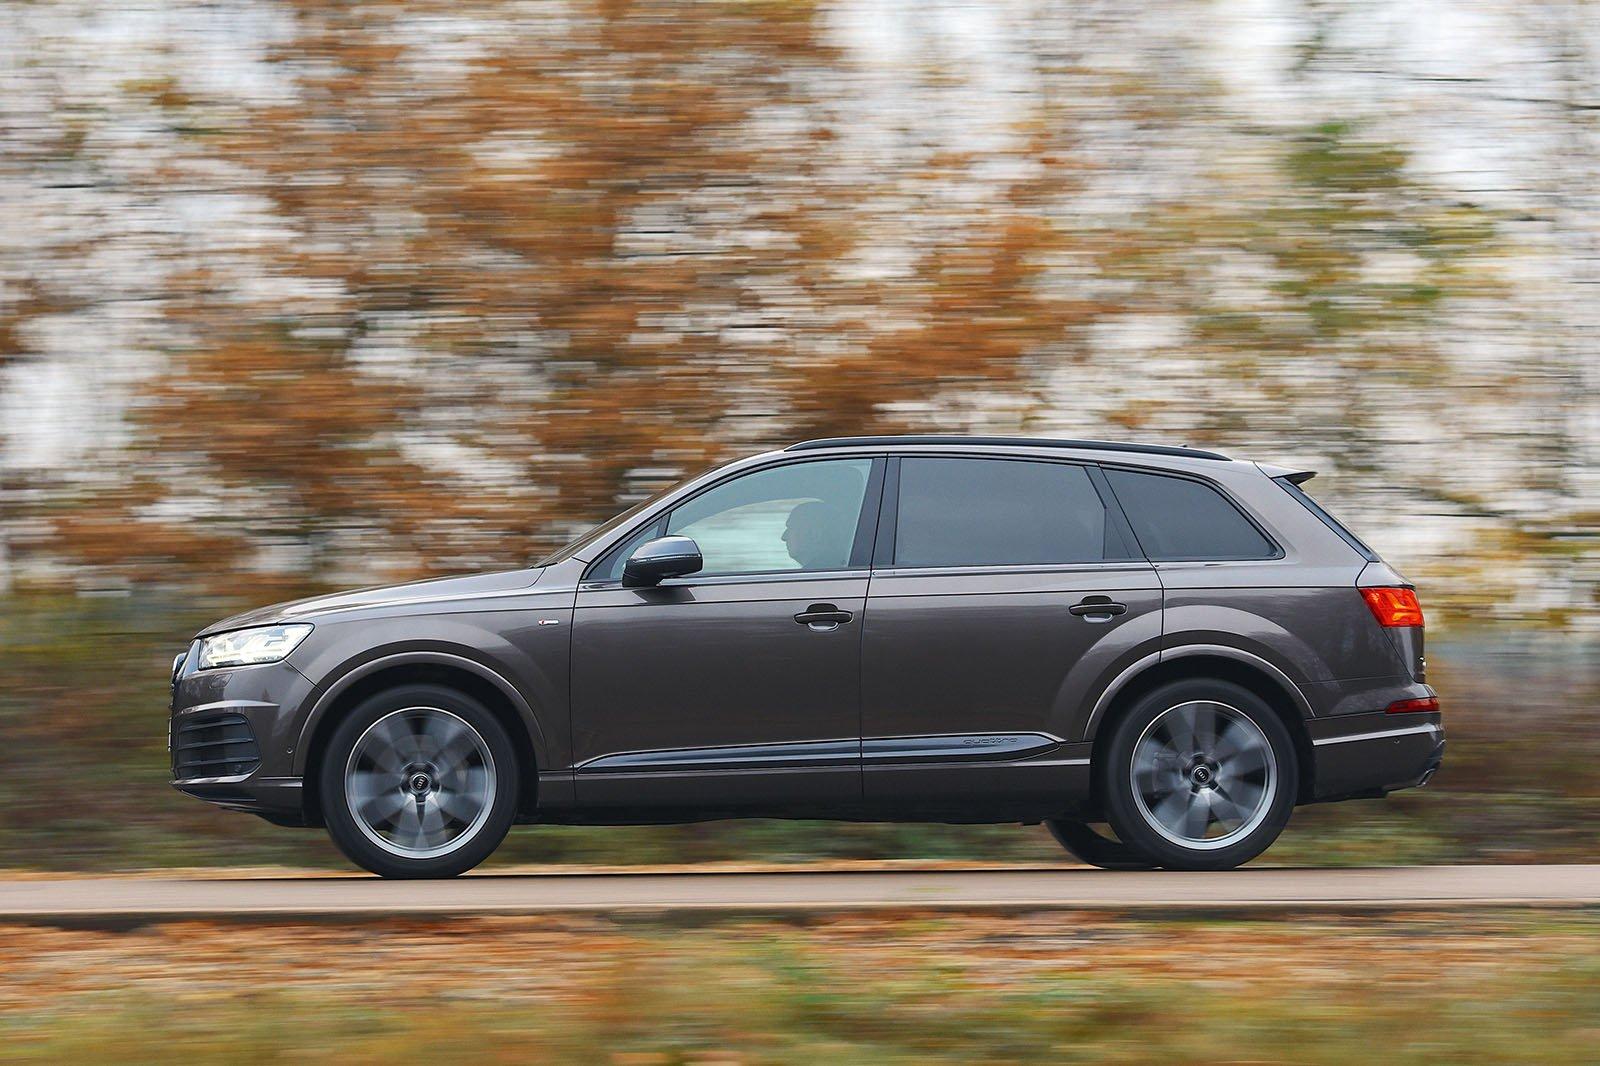 Audi Q7 driving